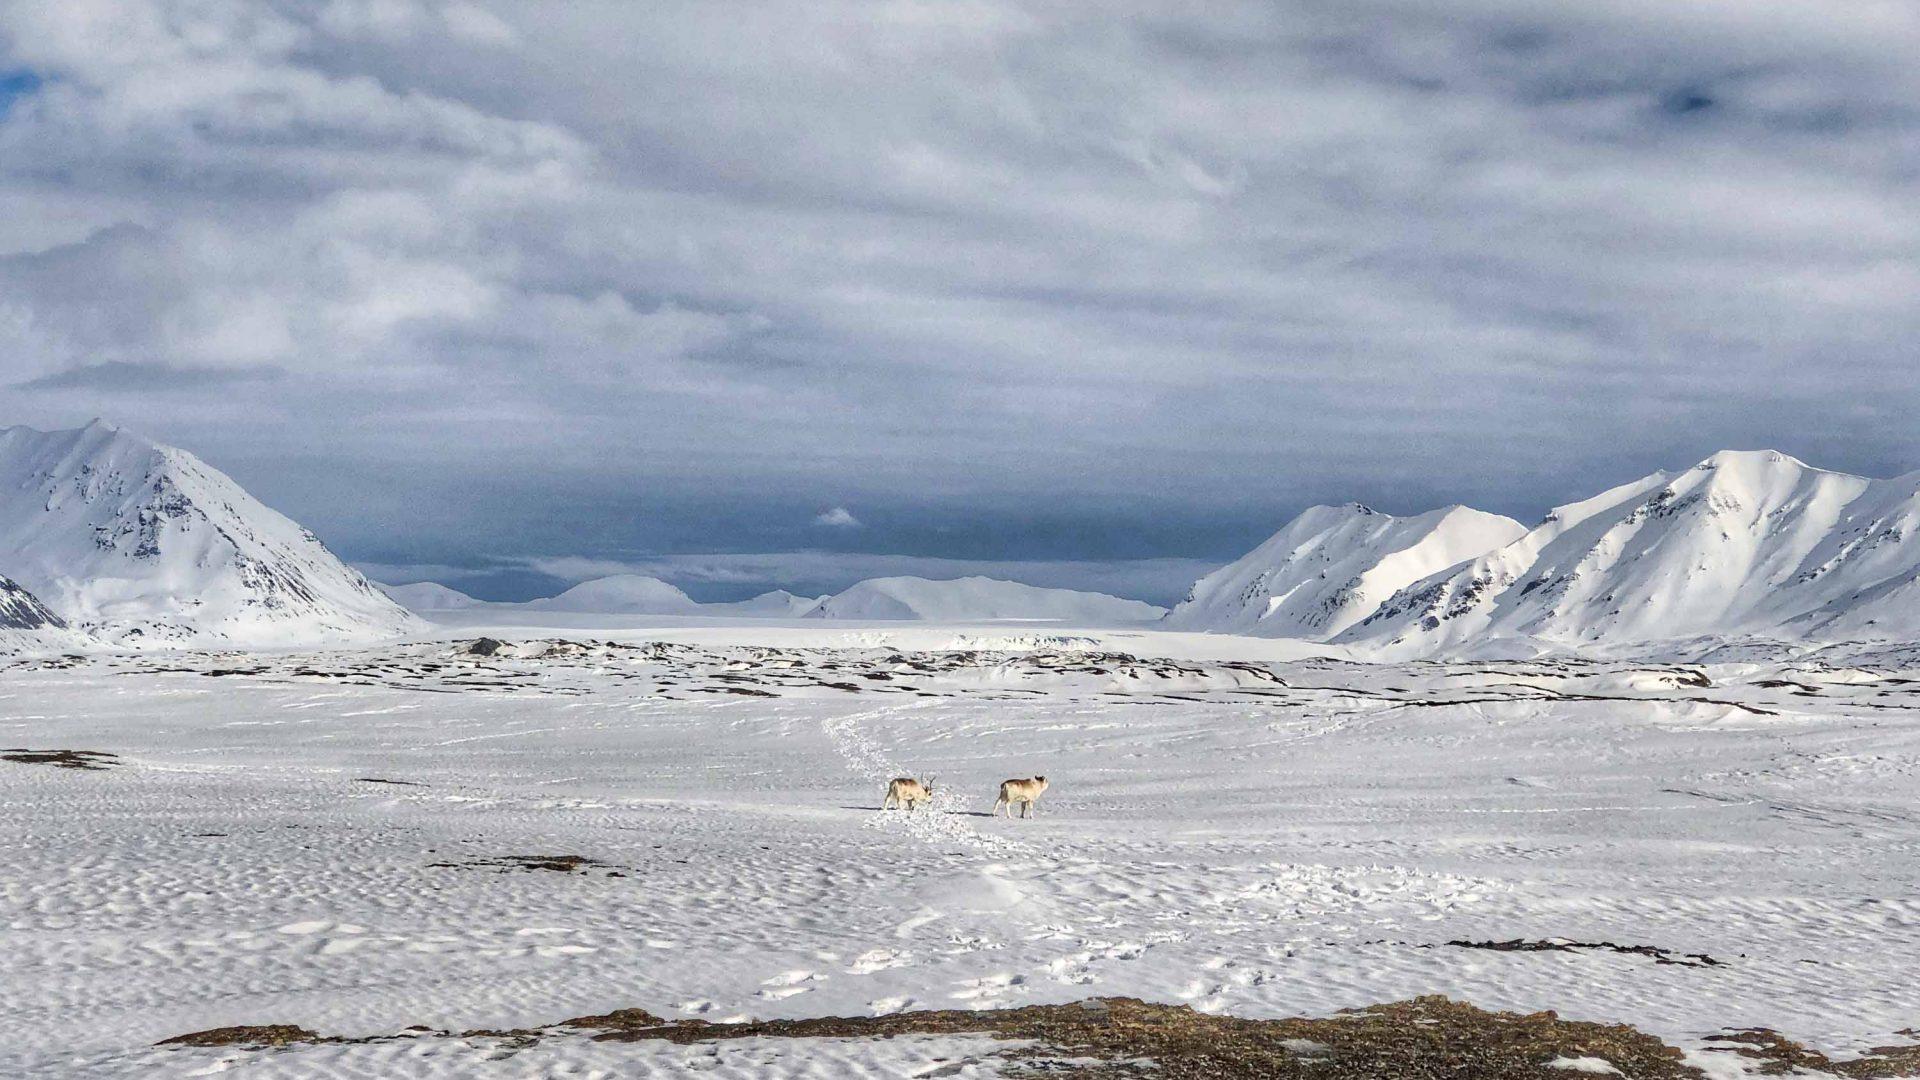 Expansive views of reindeer, glaciers and open skies.